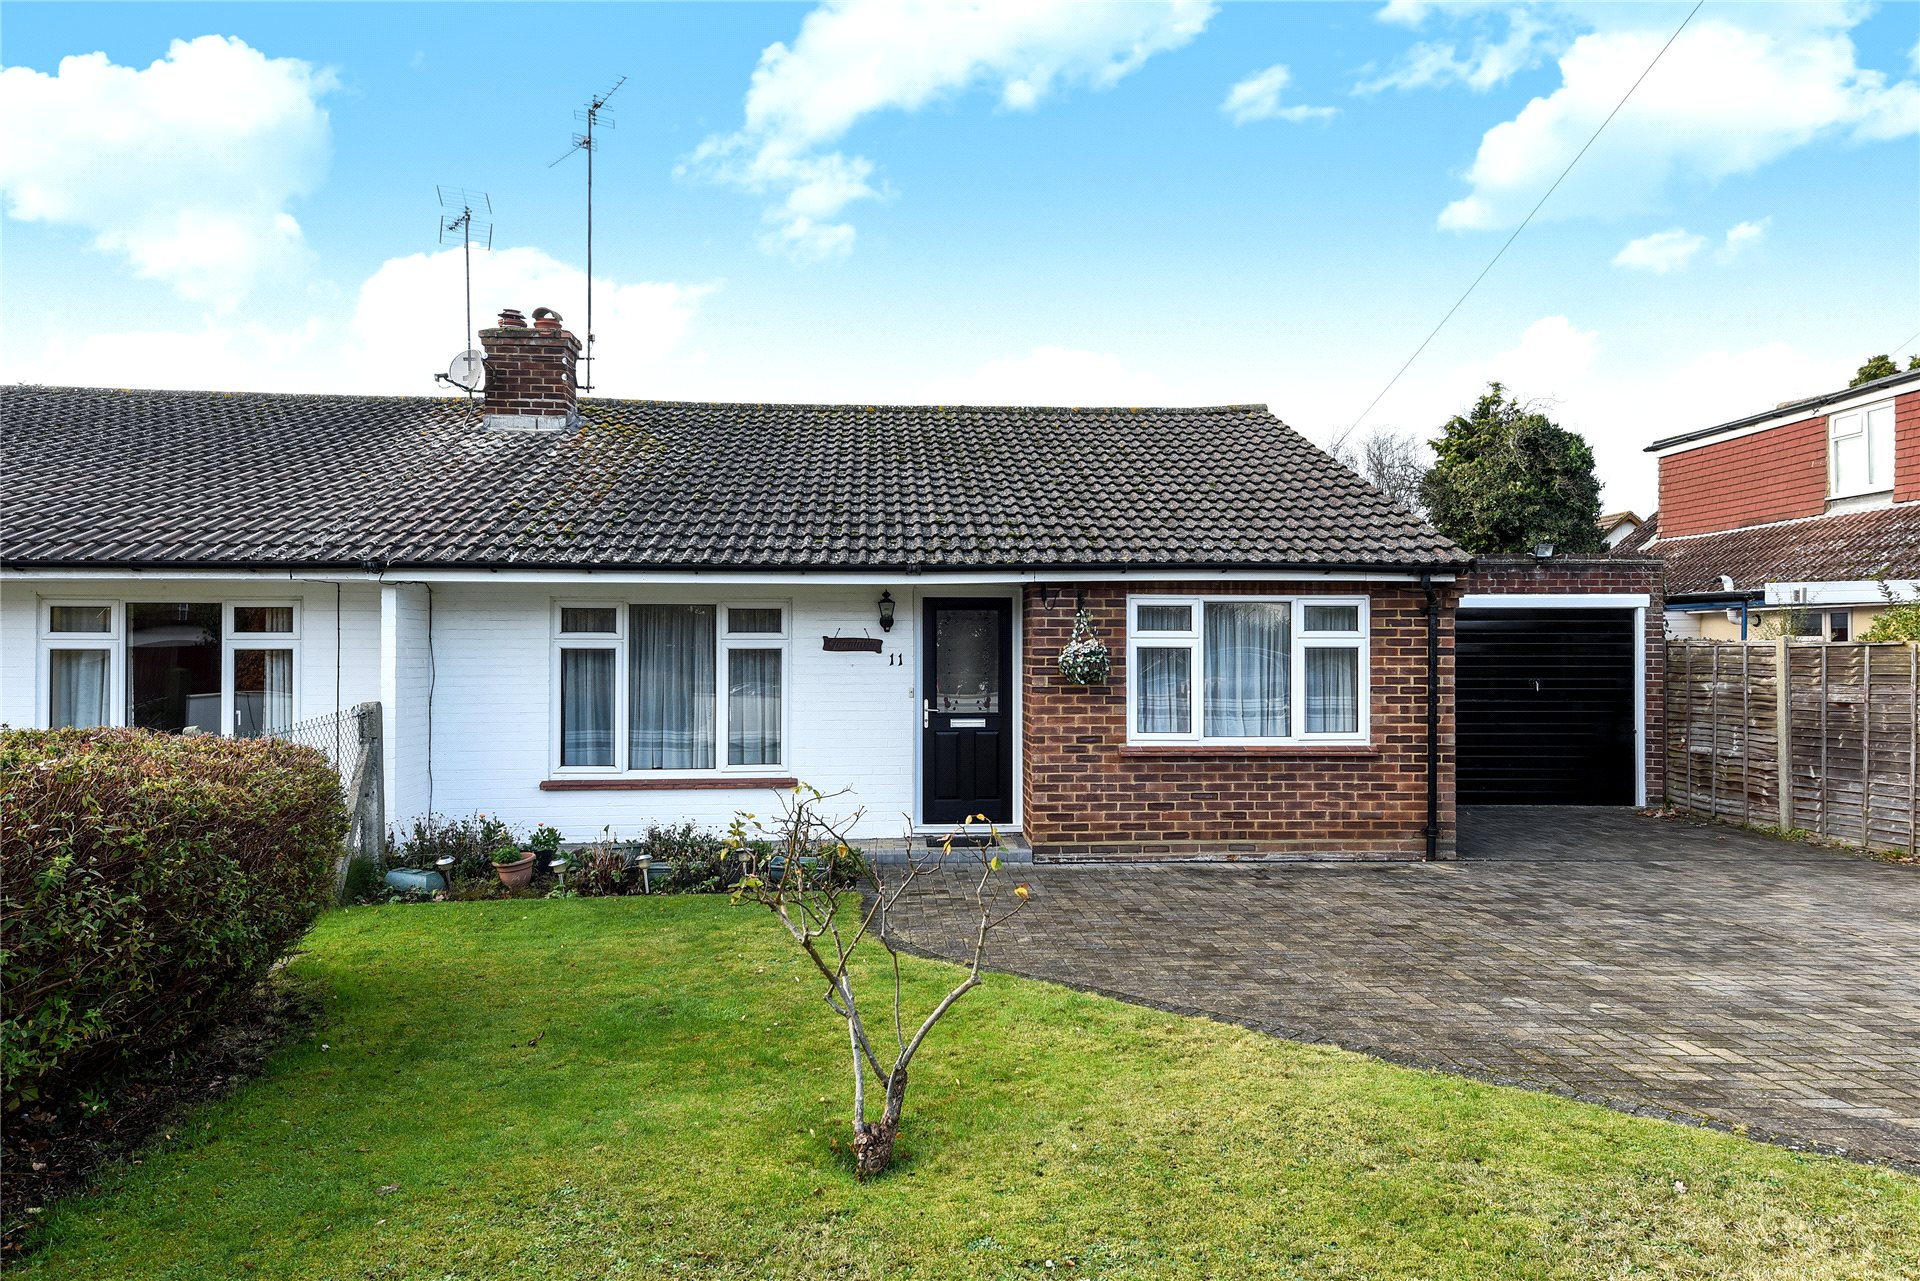 2 Bedrooms Semi Detached Bungalow for sale in Brookside, Sandhurst, Berkshire, GU47